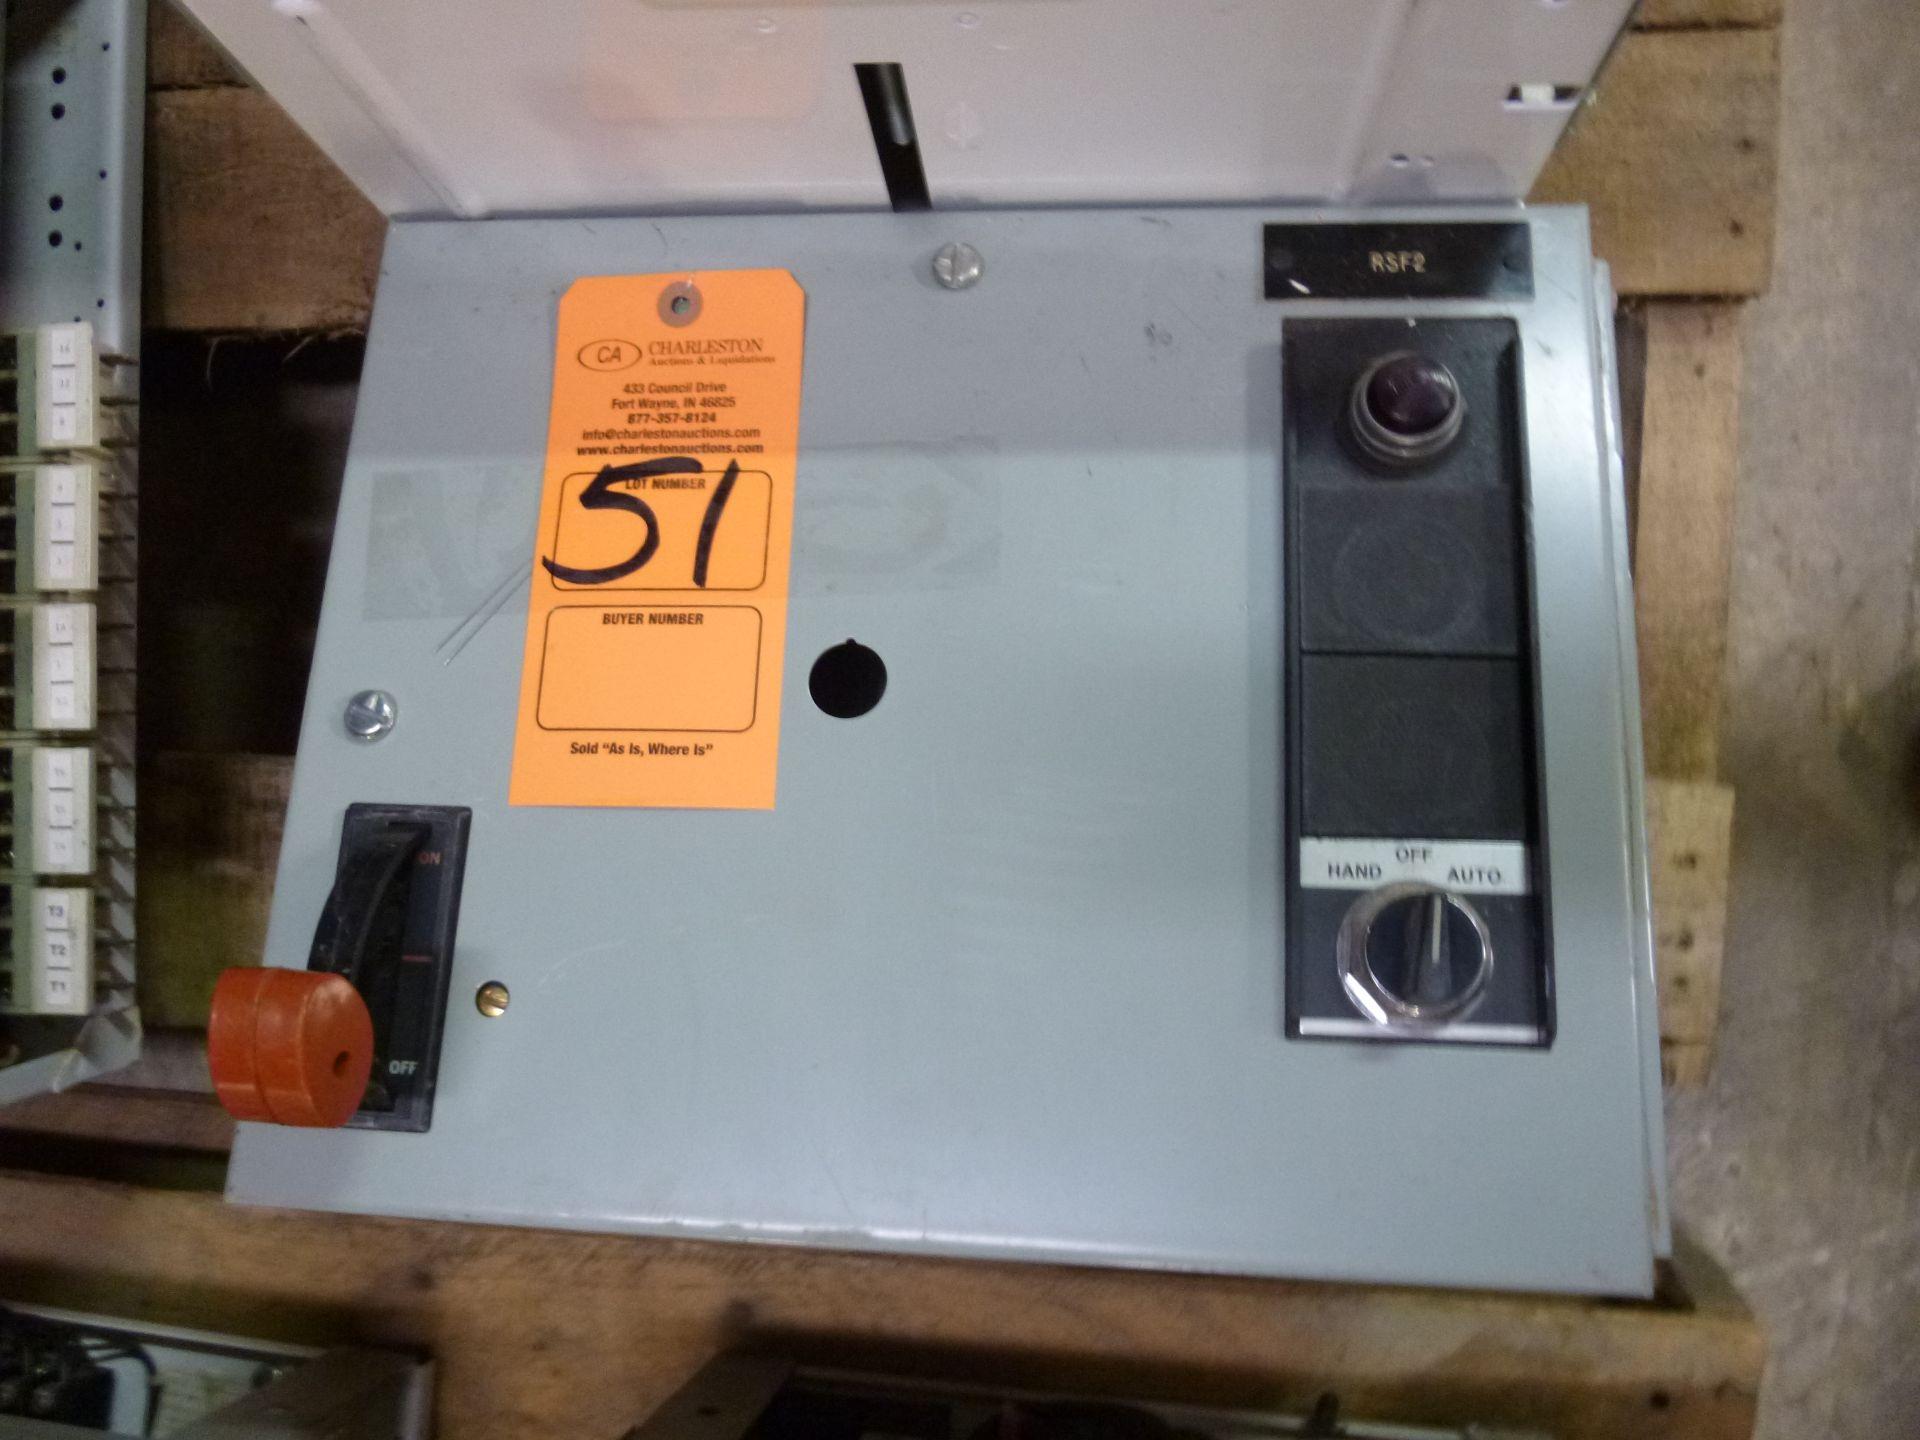 Lot 51 - GE motor control center MCC bucket model 8000, type FVNR, 3 phase, 208v, 3 hp, size 1 bucket,